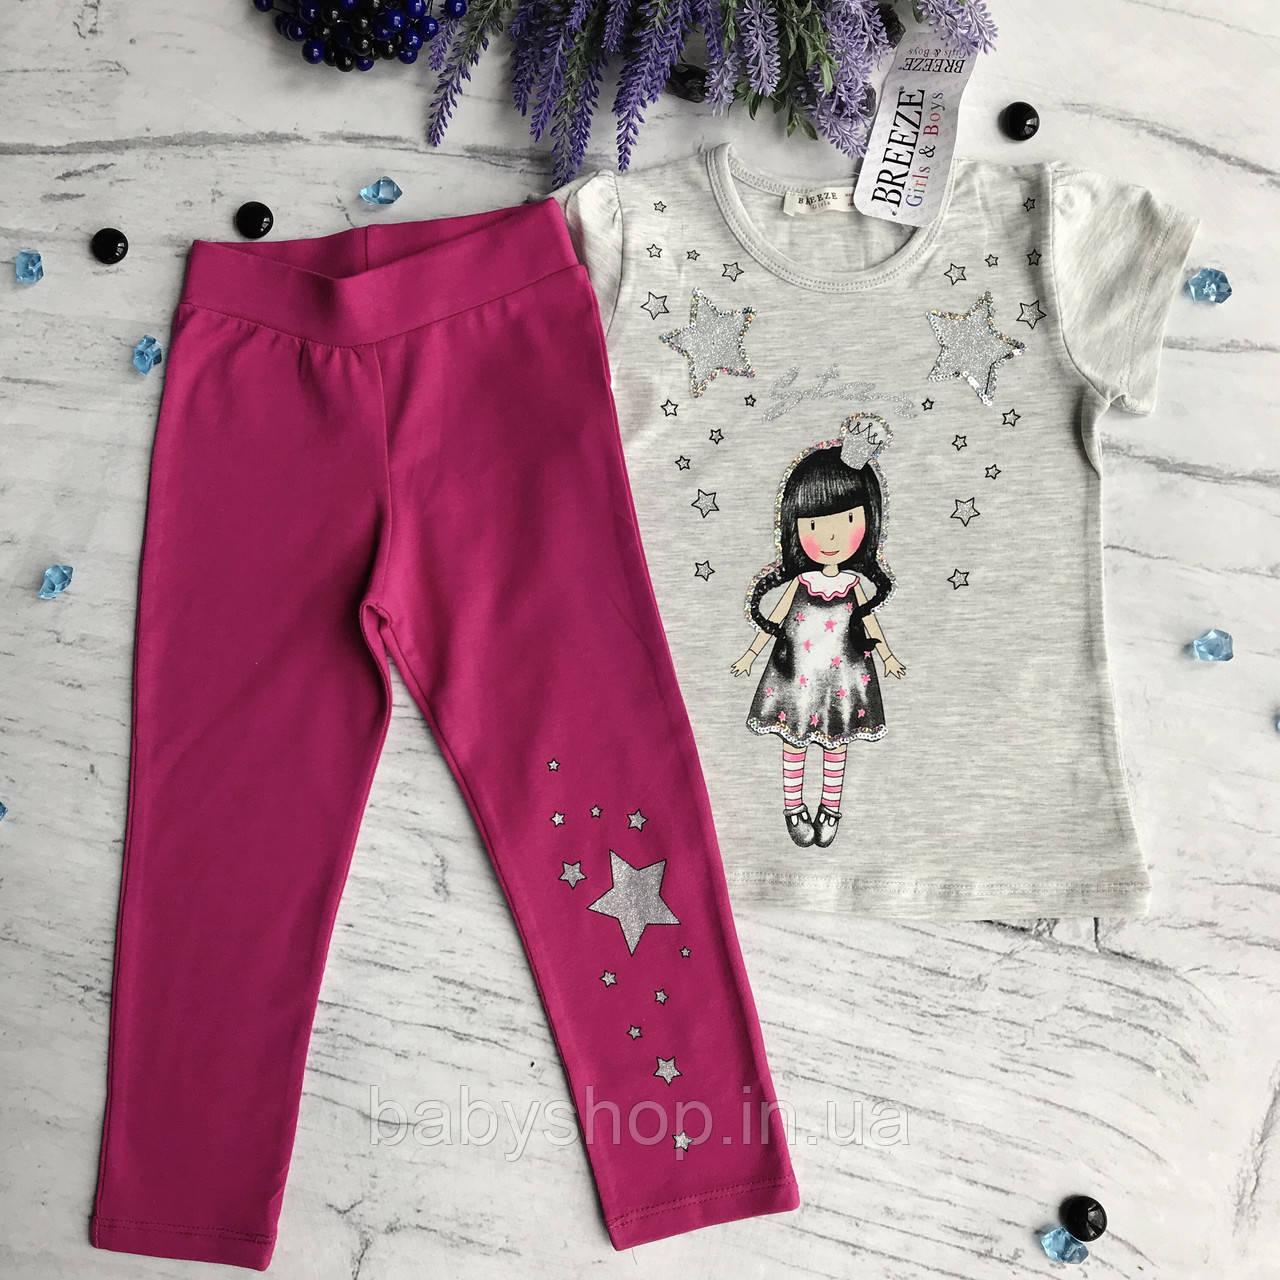 Летний костюм на девочку Breeze 73. Размер 92 см, 98 см, 104 см, 110 см, 116 см